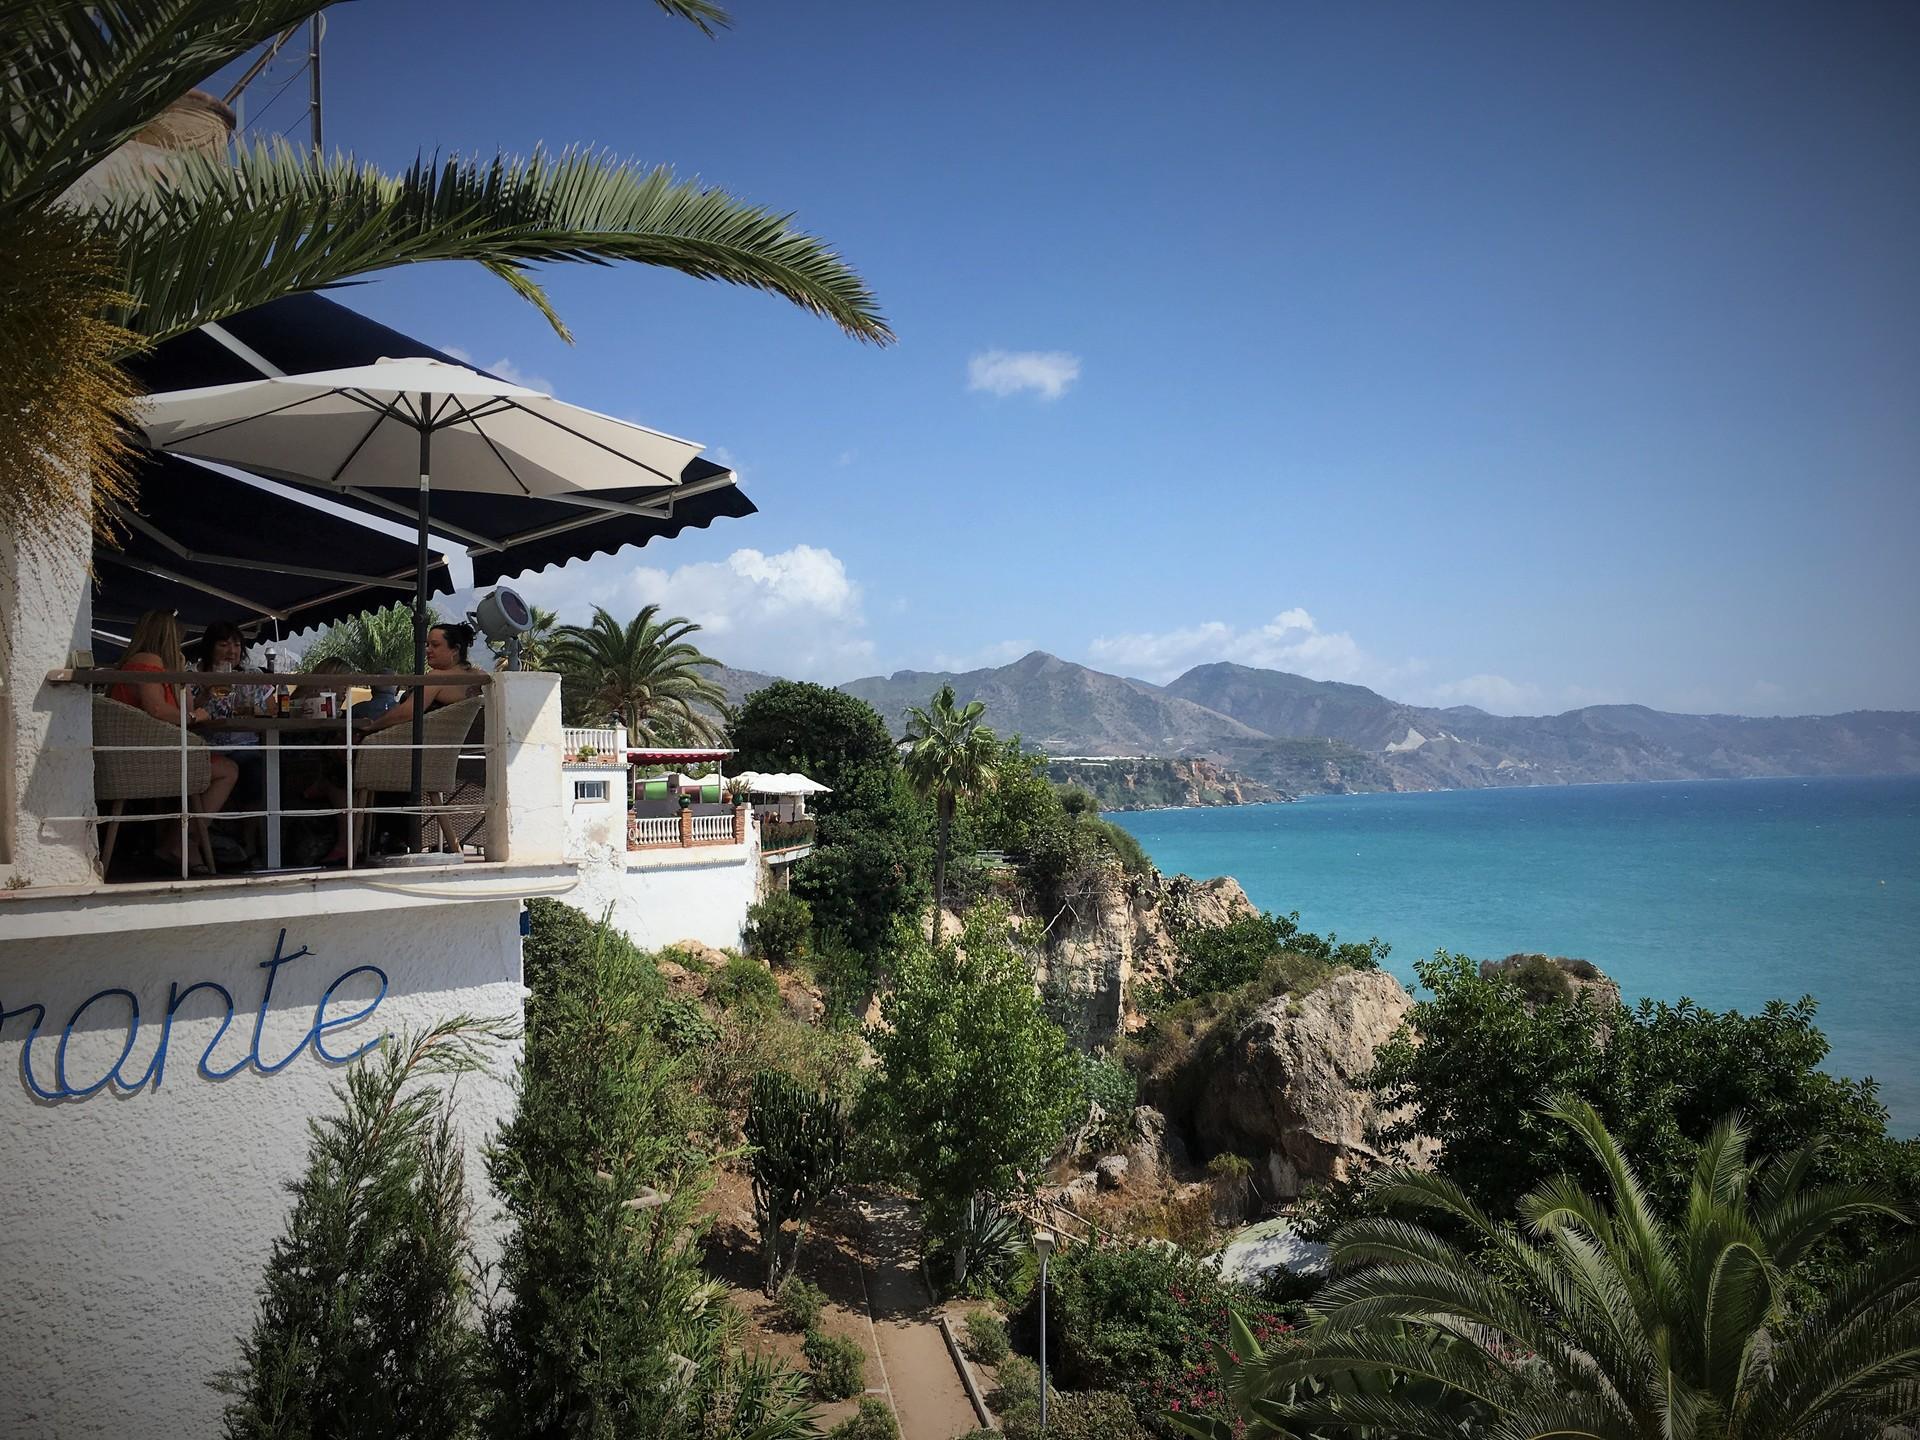 nerja-cosiest-place-costa-del-sol-460470